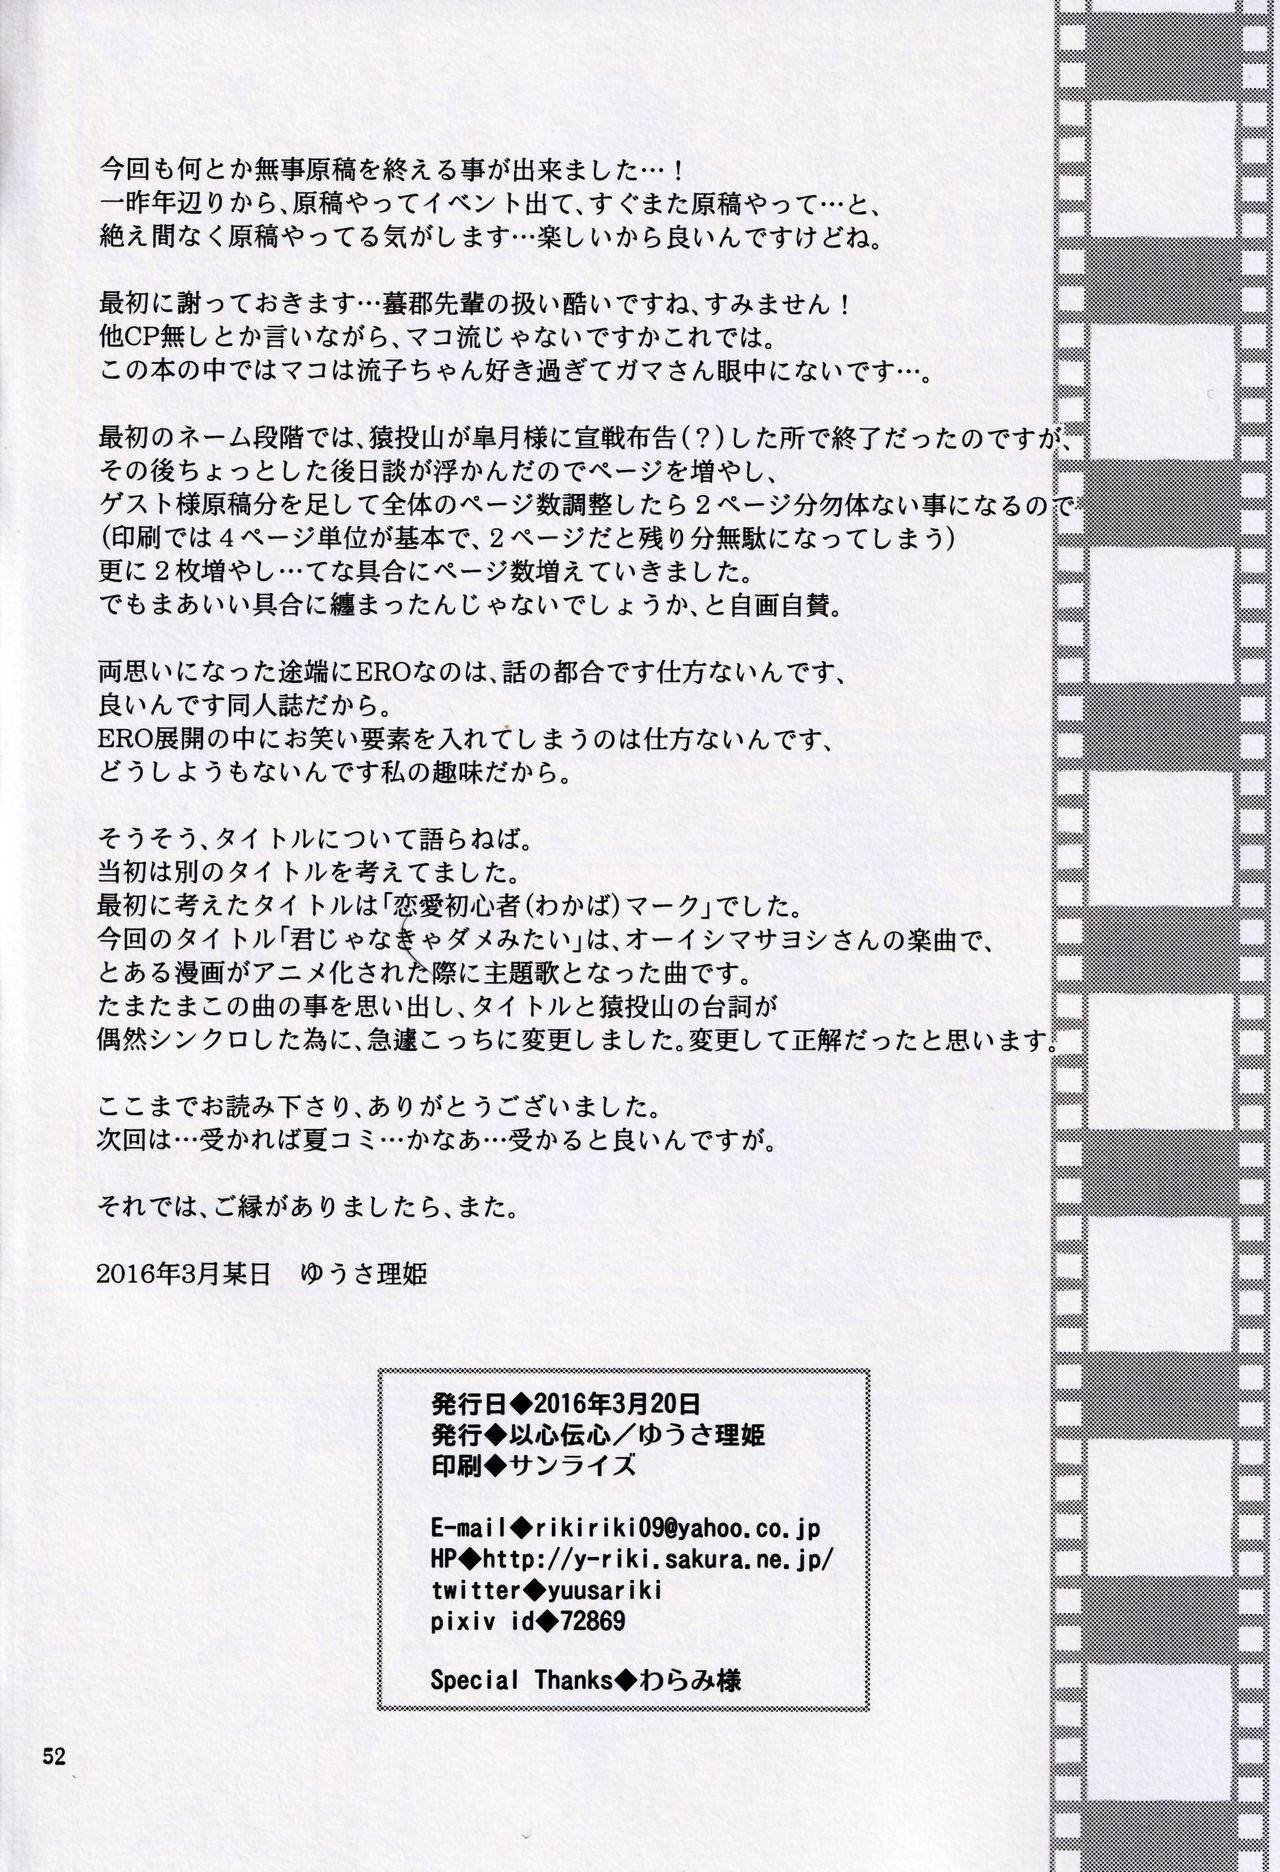 Kimija Nakya Dame Mitai 51